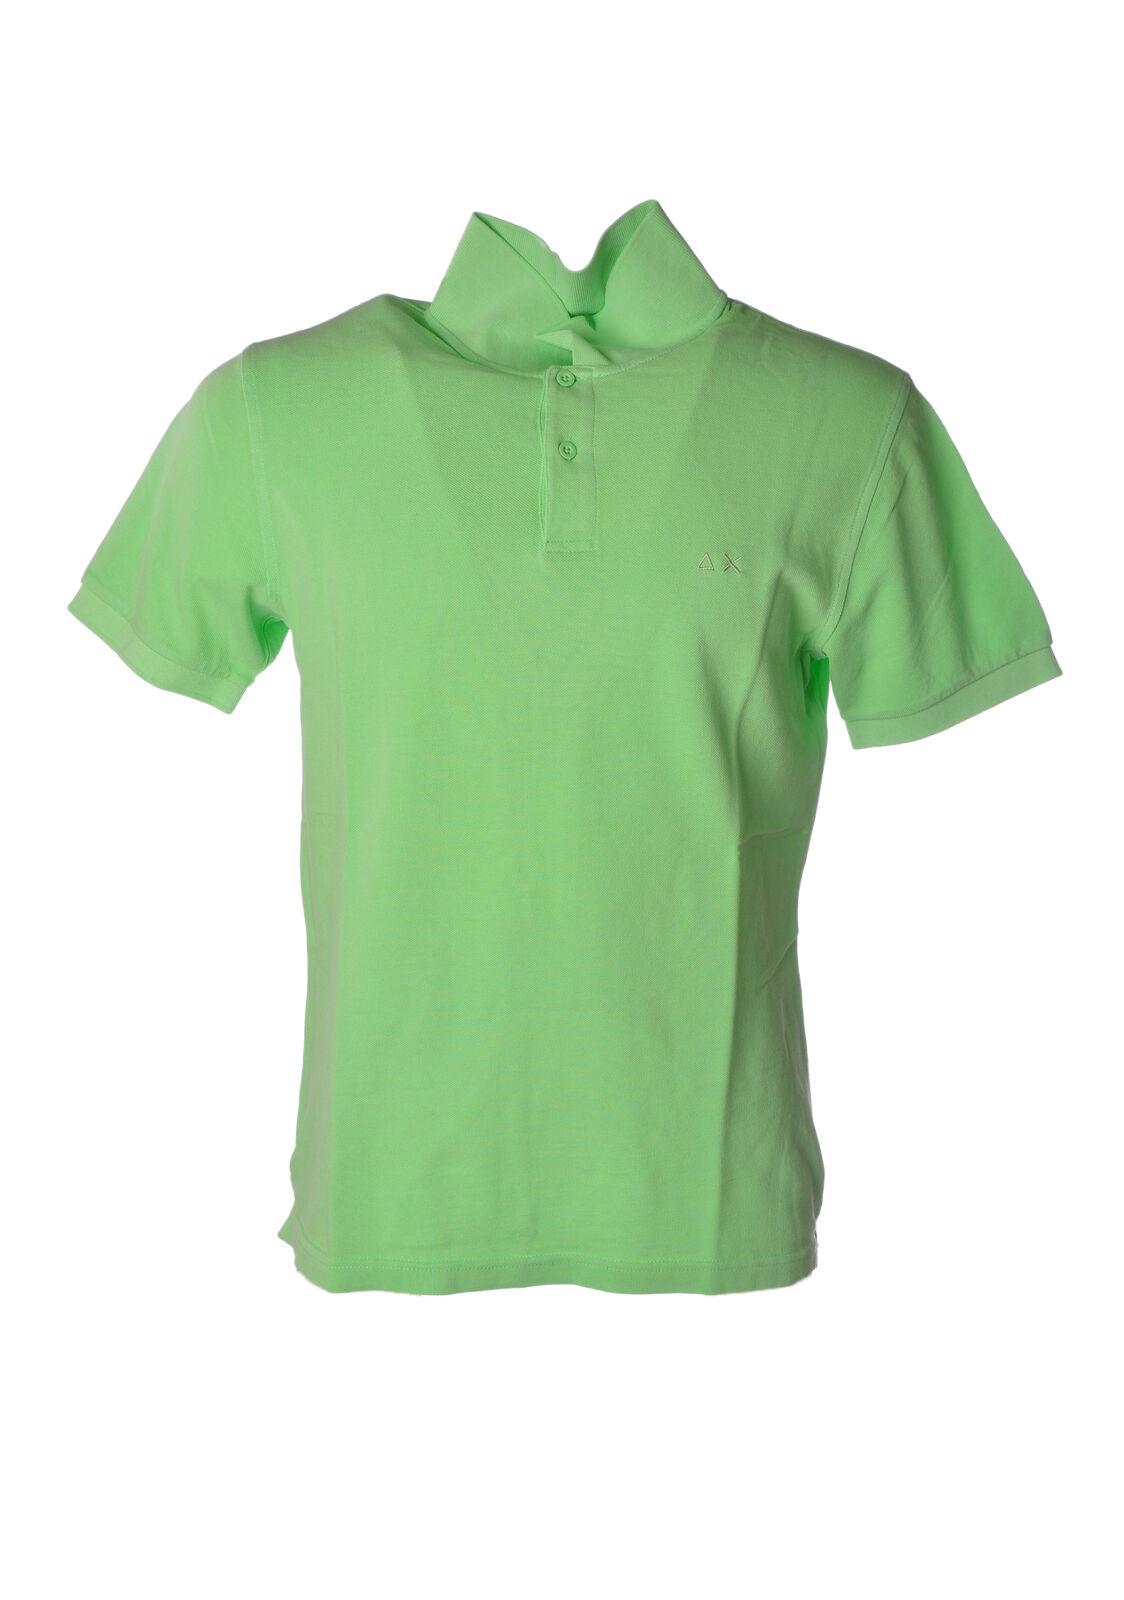 Sun 68 - Topwear-Polo - Man - Green - 4926406C194837